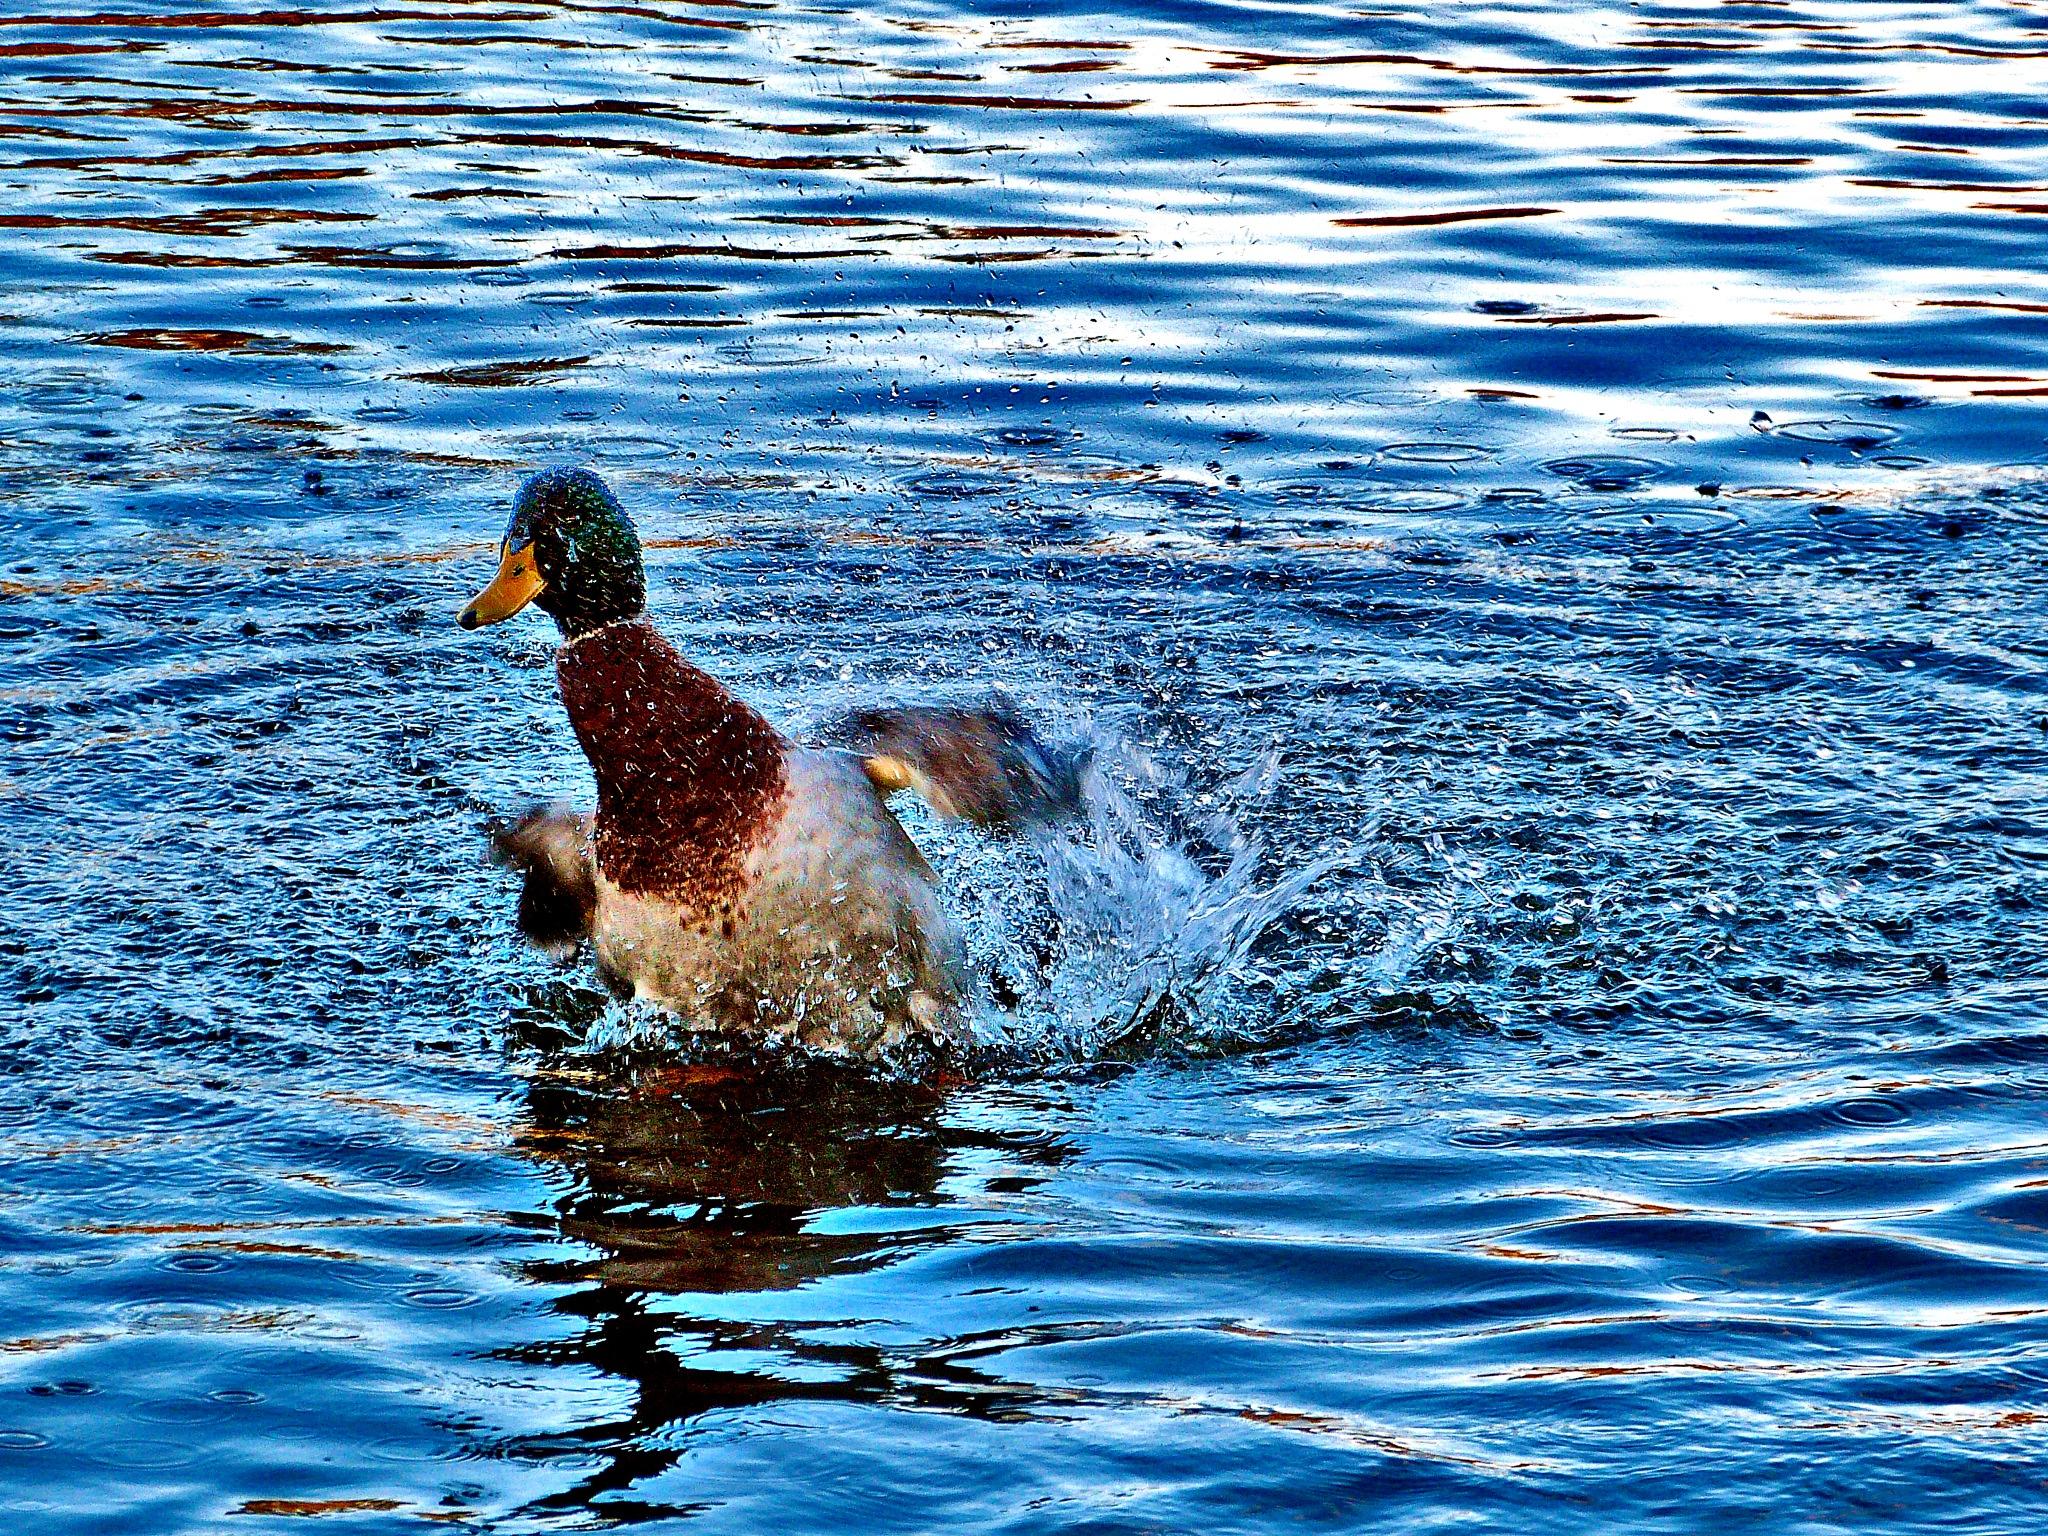 Big Splash by PeterMChambers